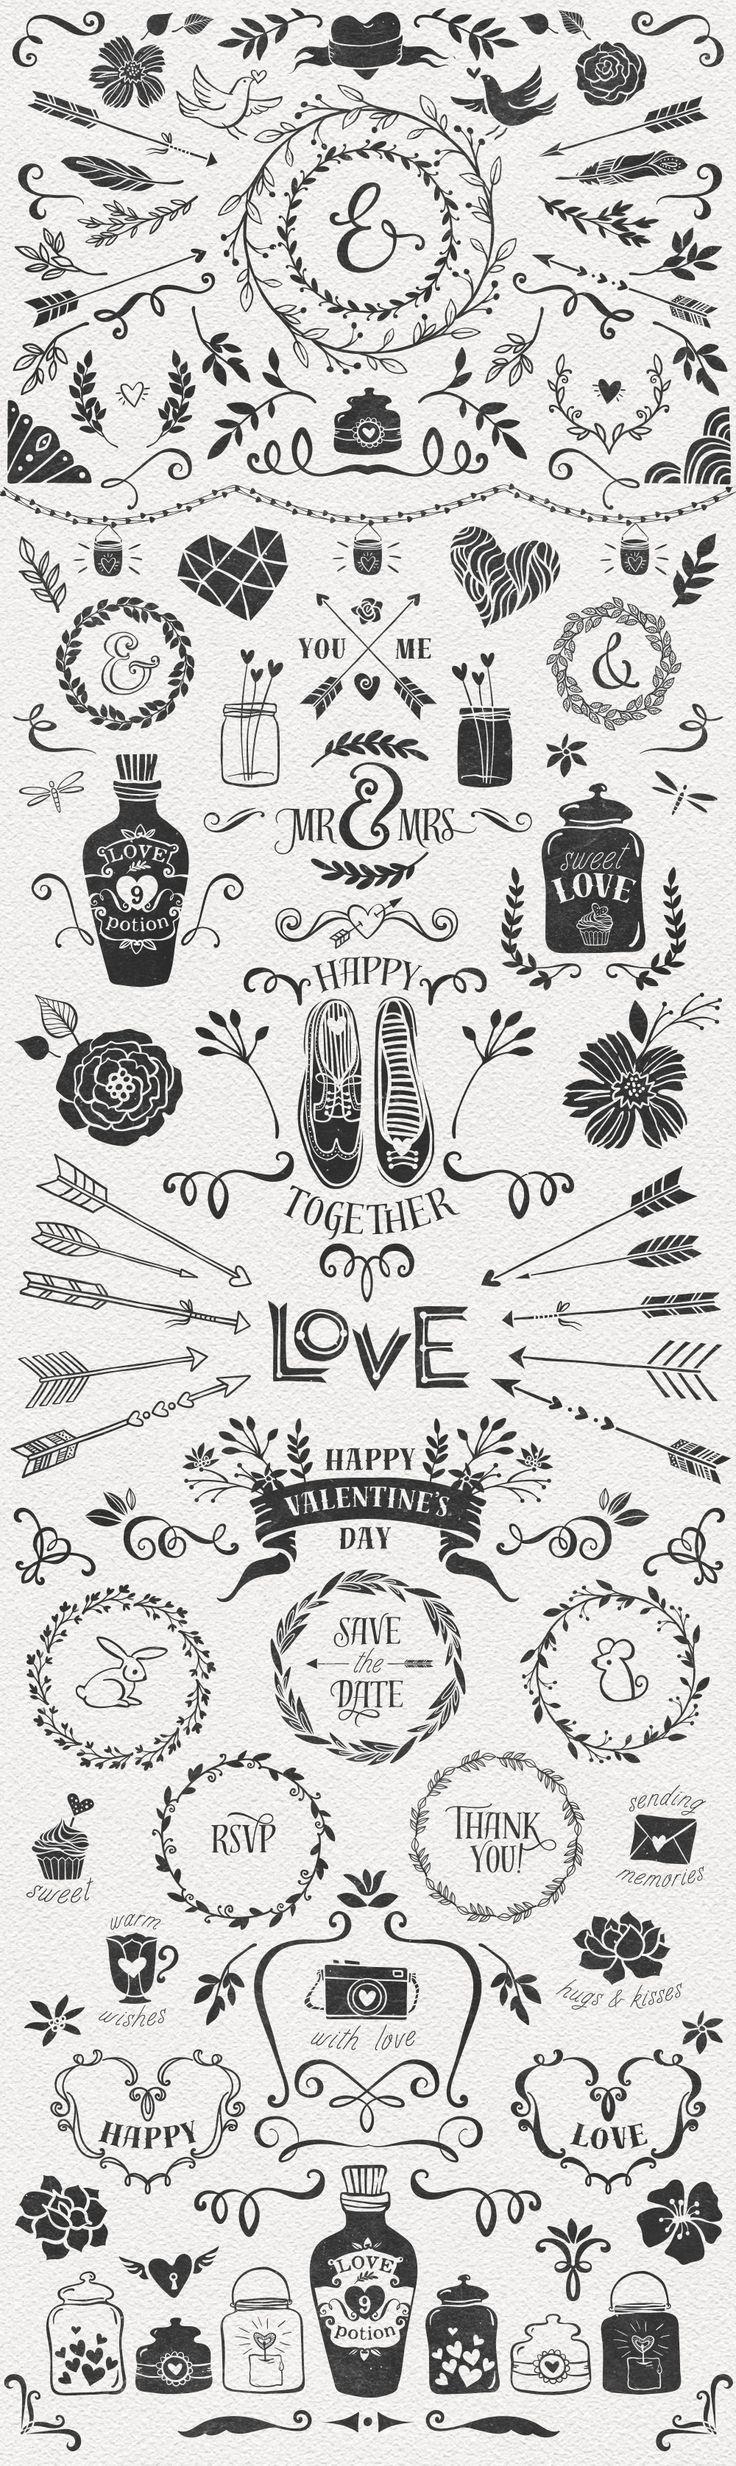 Hand Drawn Romantic Decoration Pack by kite-kit on @creativemarket